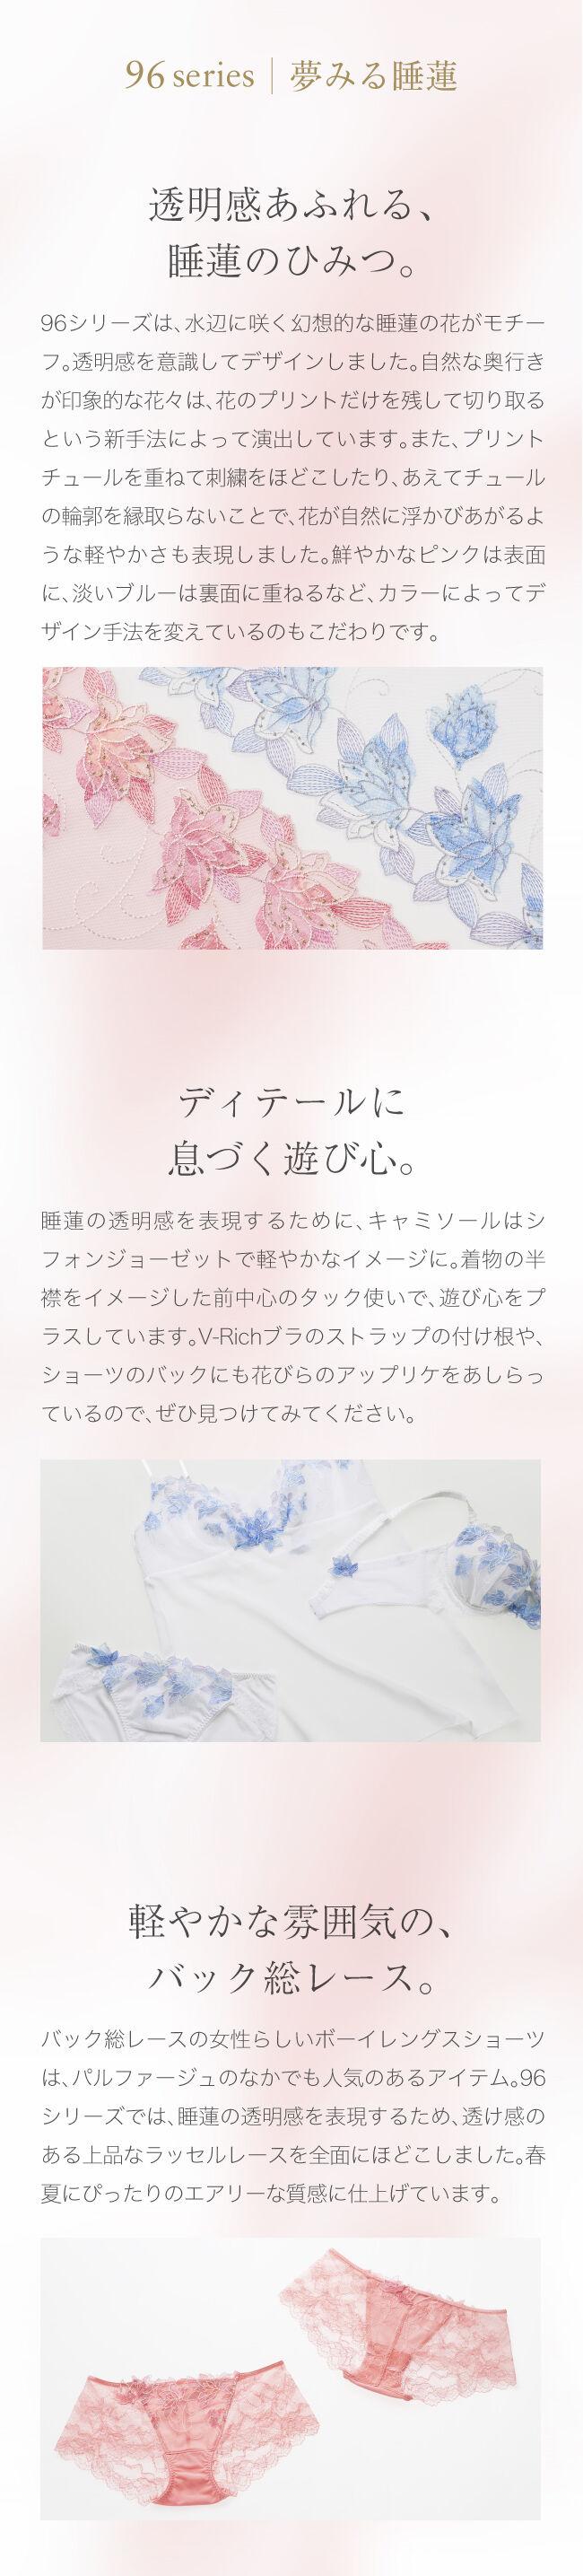 96series 夢みる睡蓮